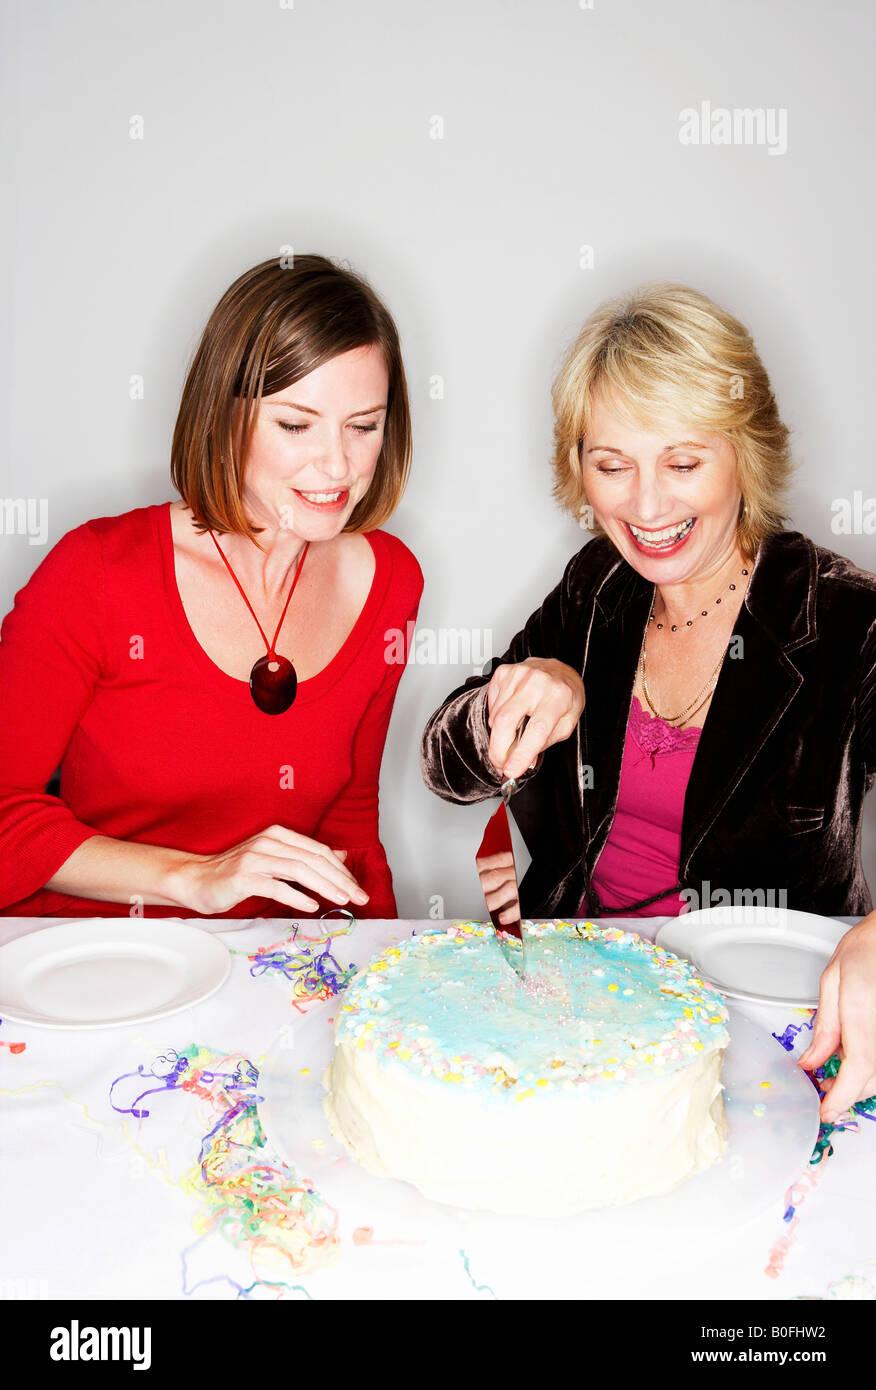 Stupendous Two Women Cutting Birthday Cake Stock Photo 17553678 Alamy Birthday Cards Printable Benkemecafe Filternl